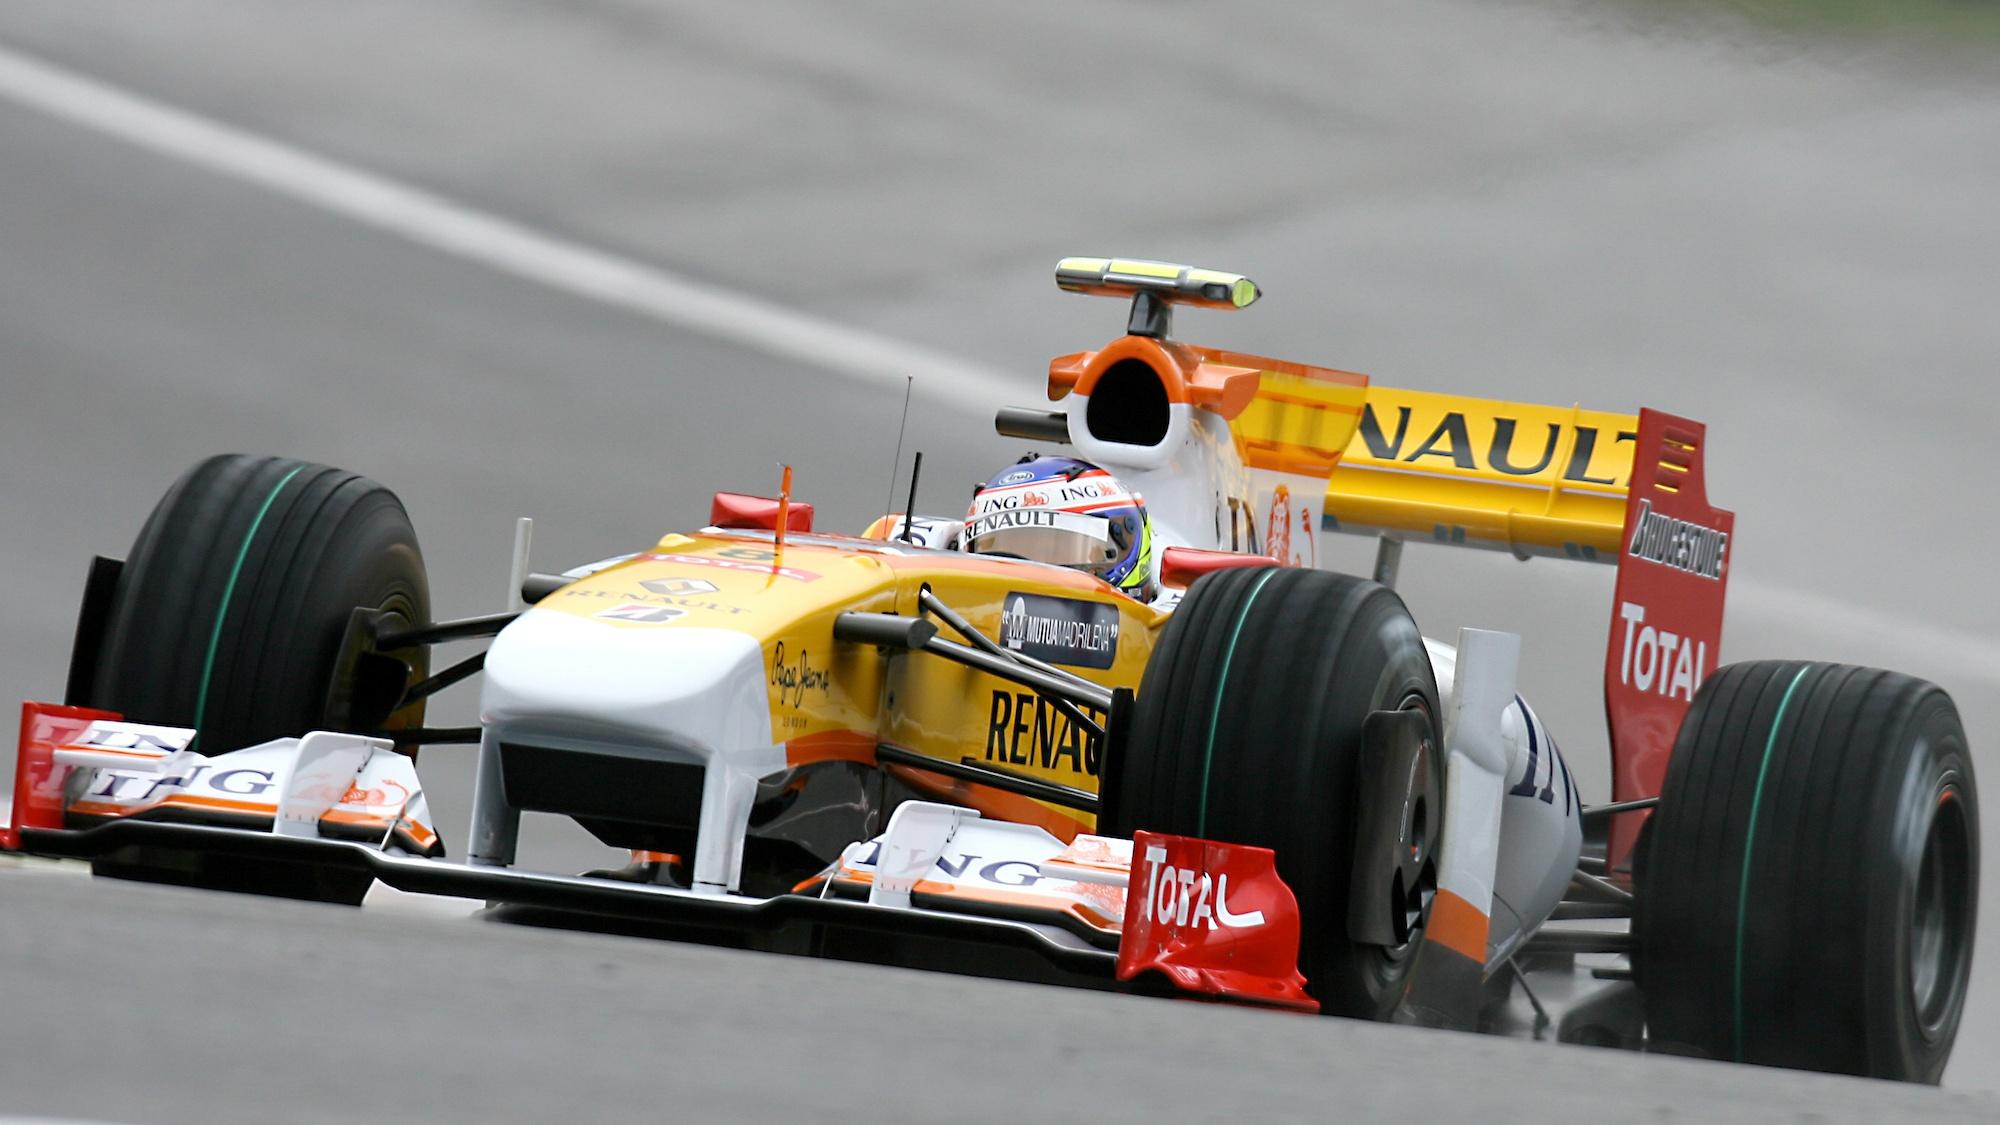 Romain Grosjean, 2009 Belgian GP